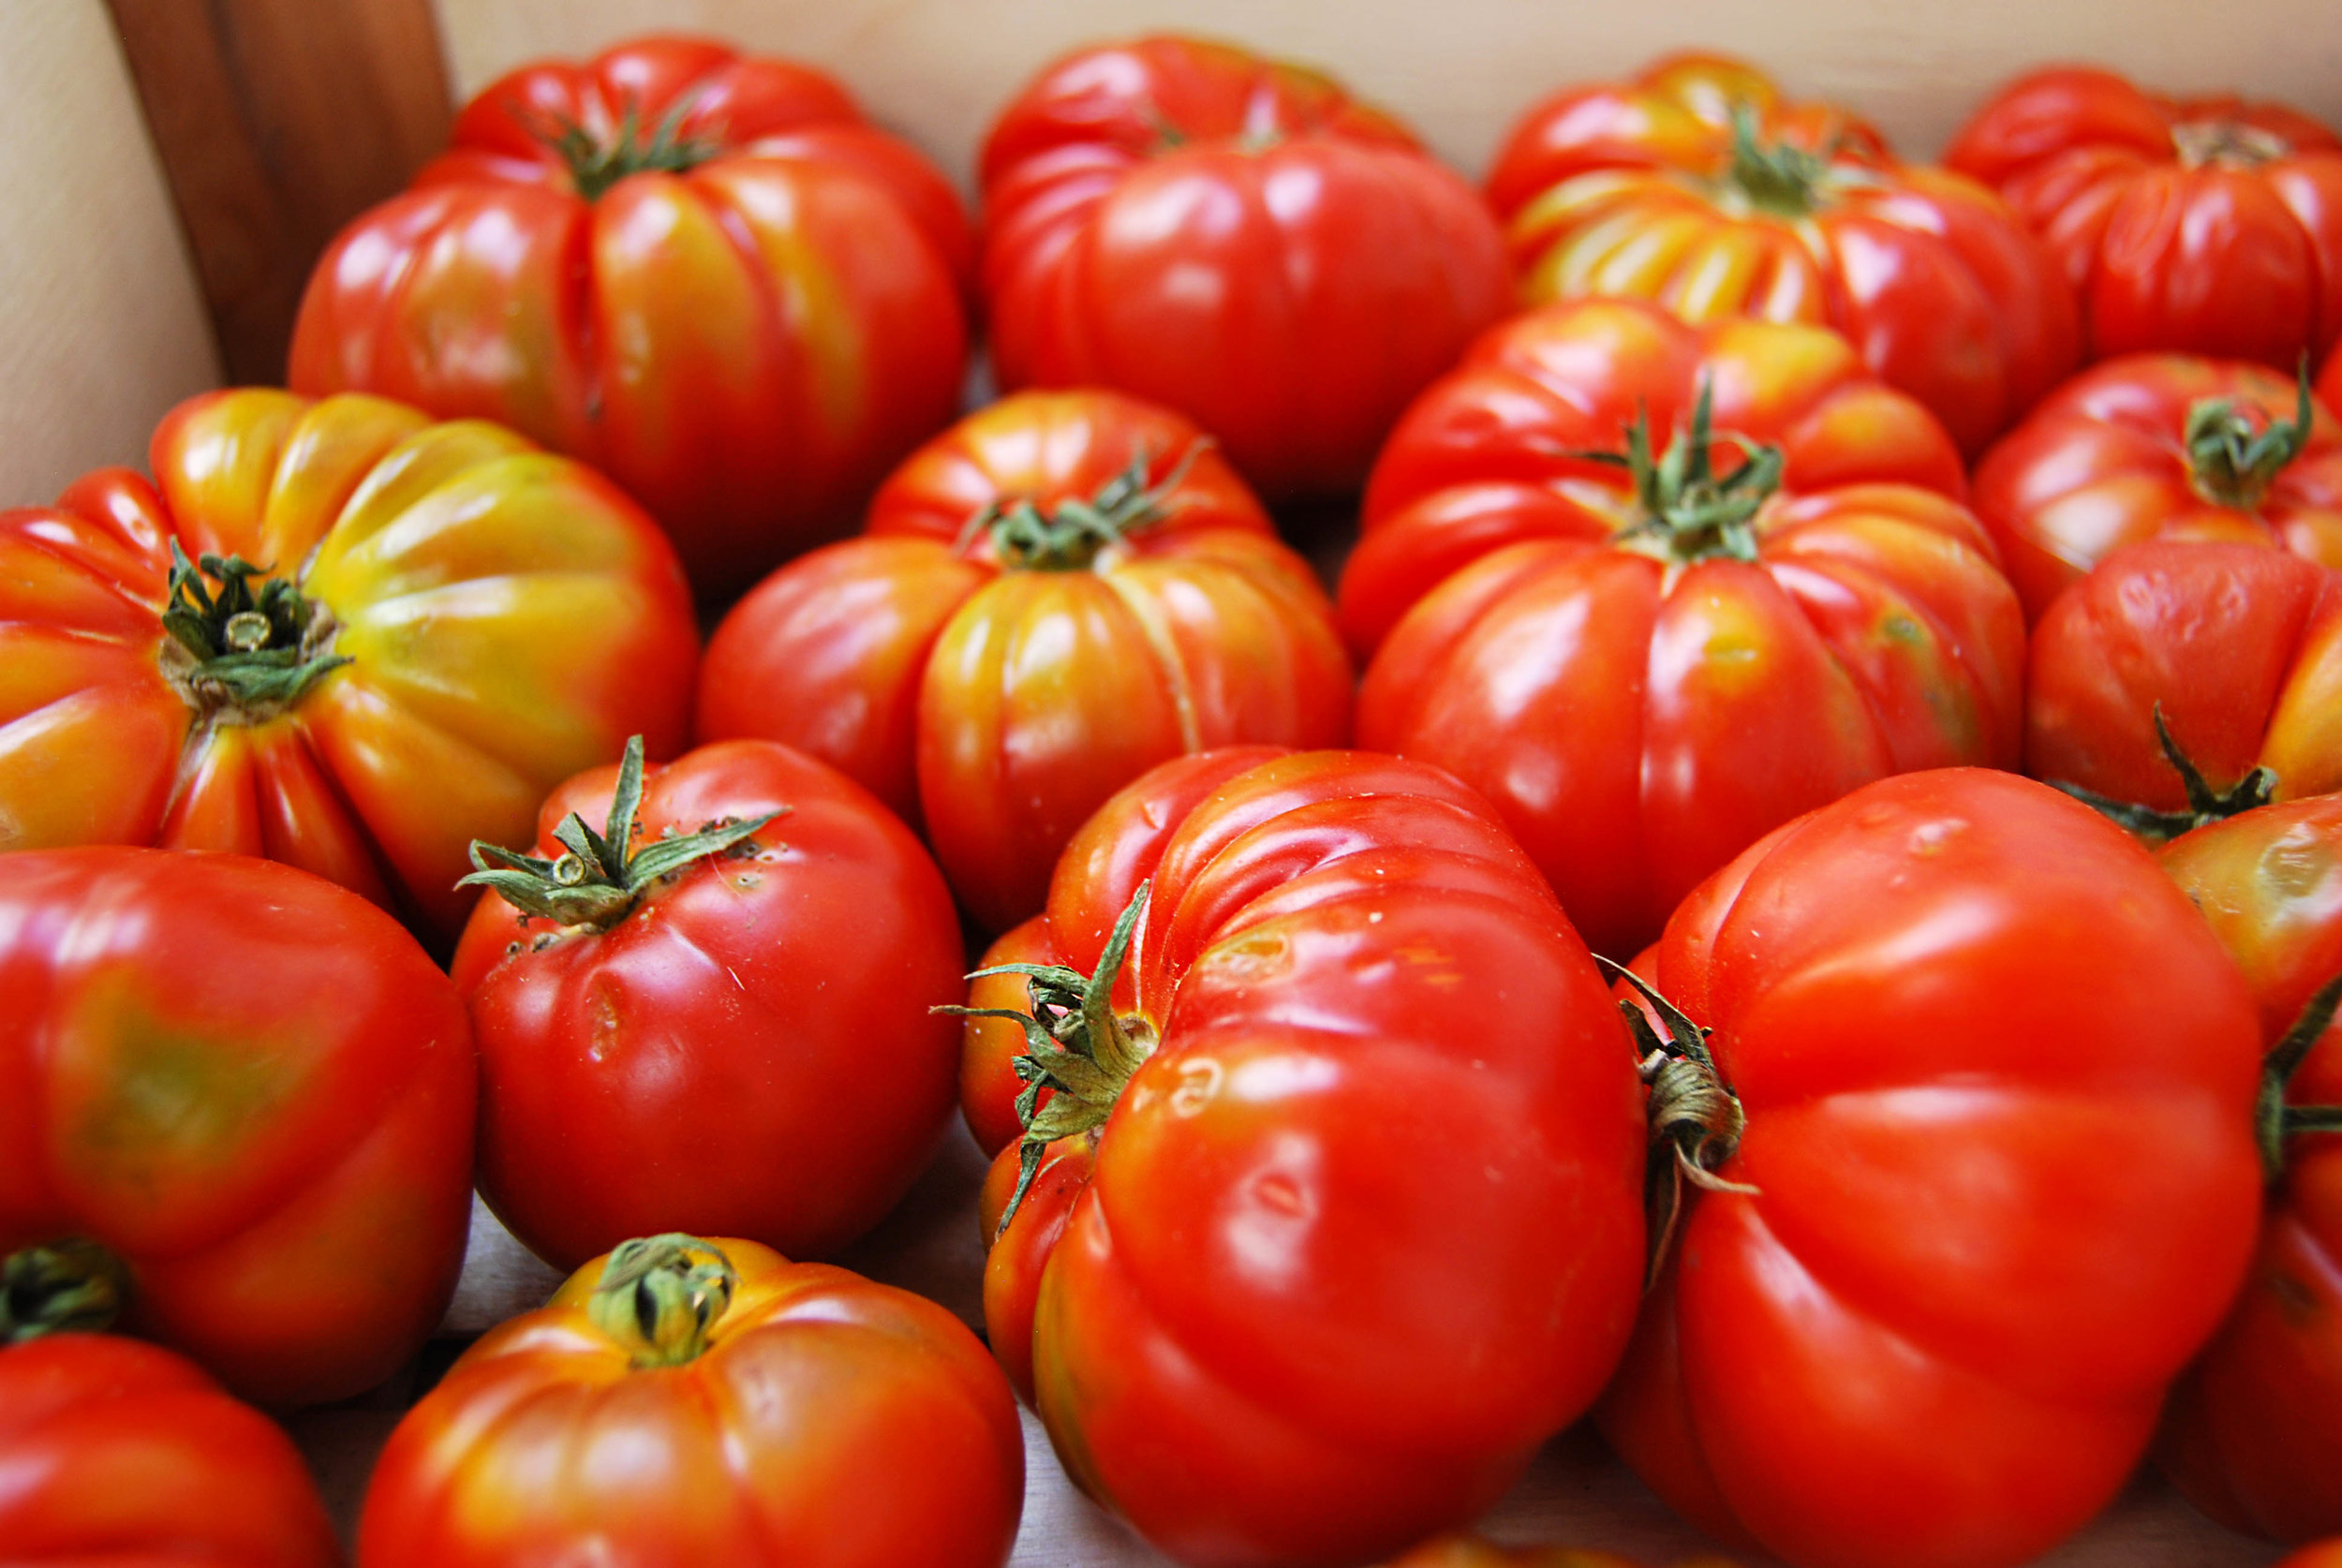 tomatoes - costuluto web.jpg